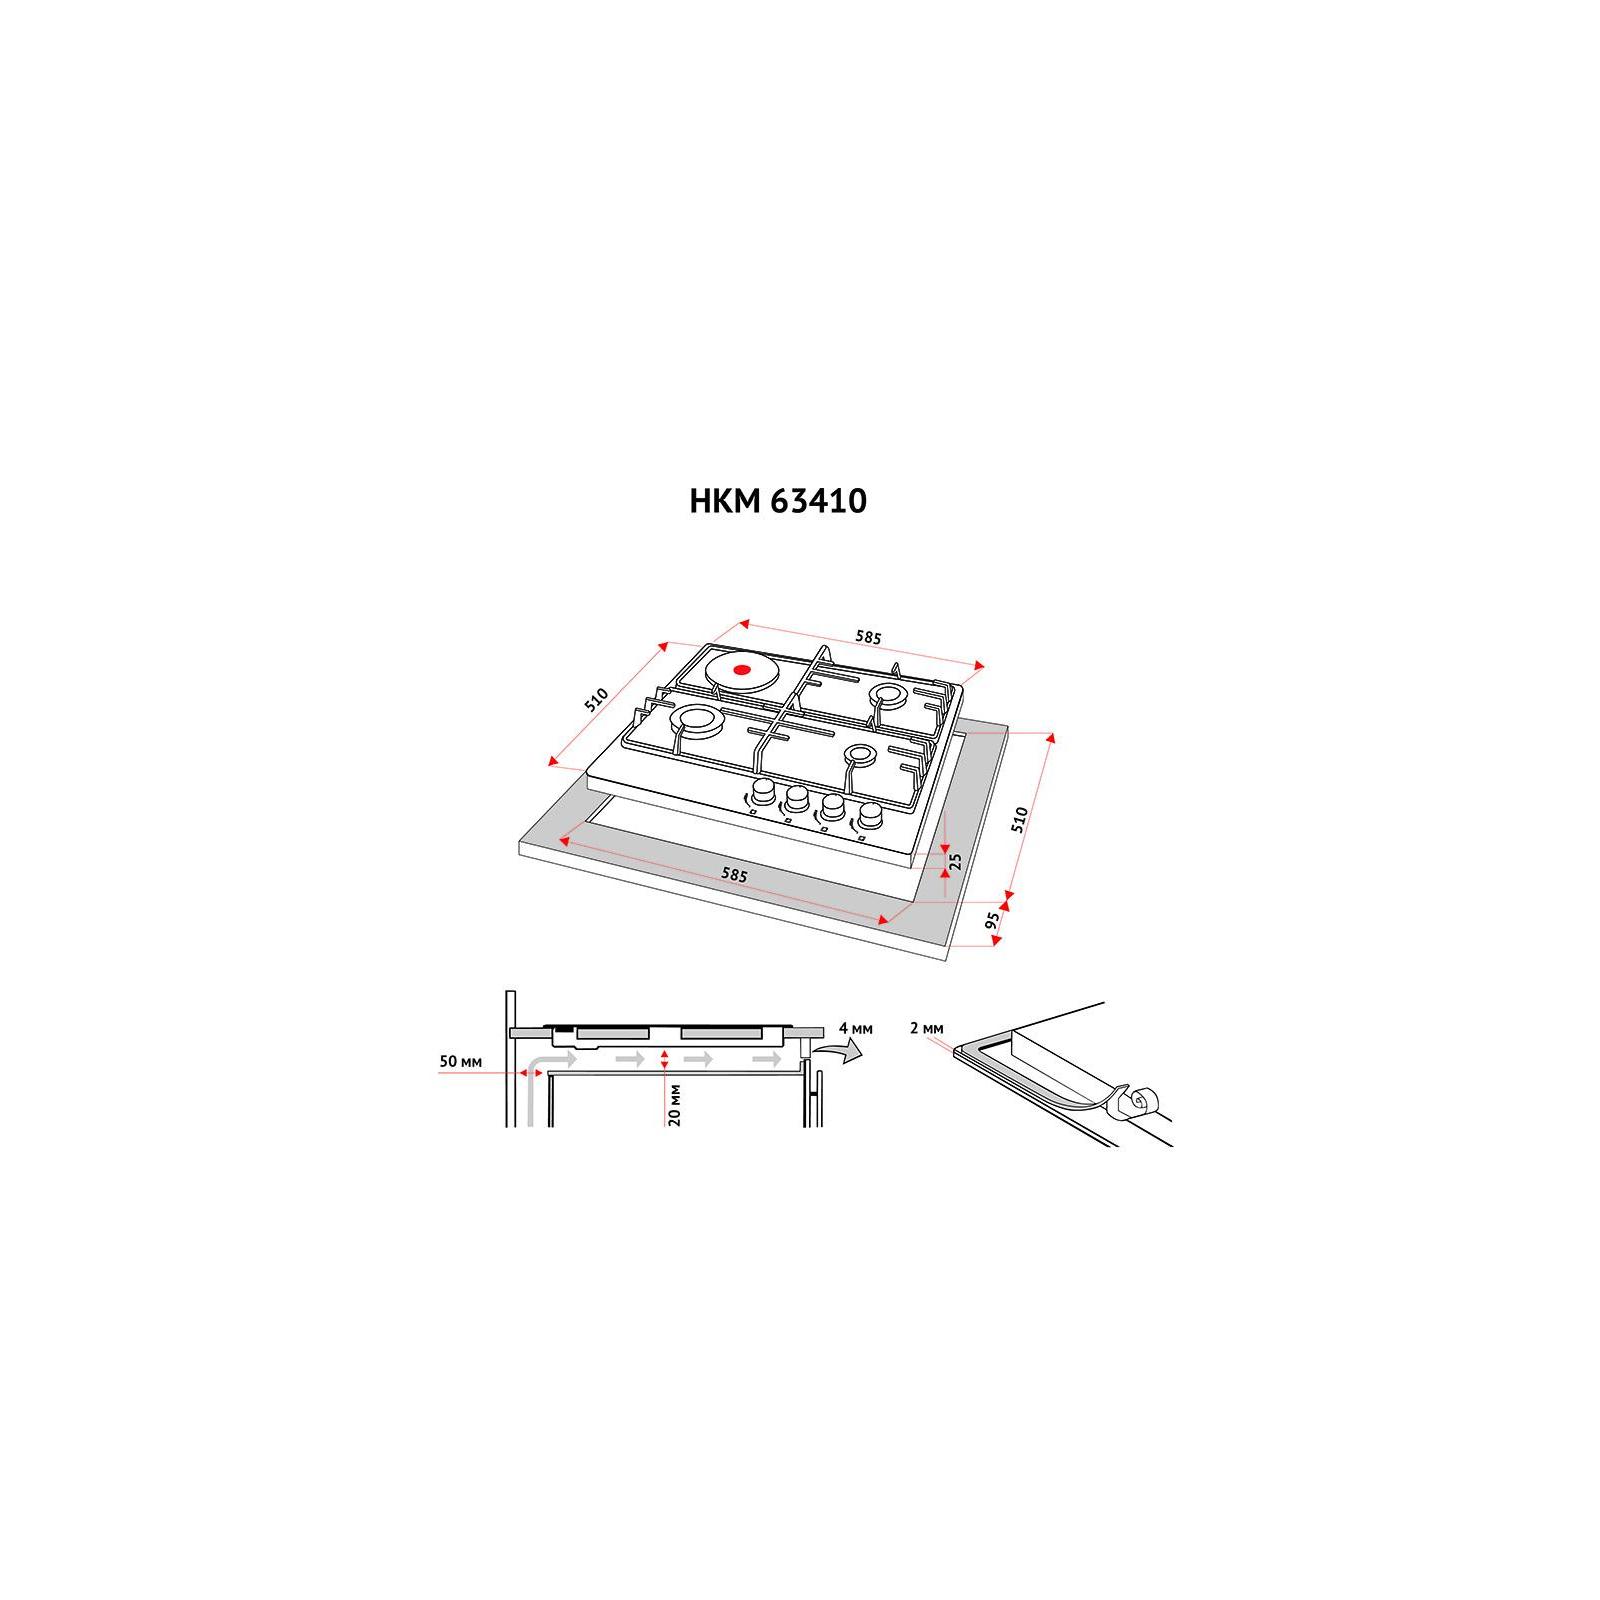 Варочная поверхность PERFELLI HKM 63410 BL изображение 7